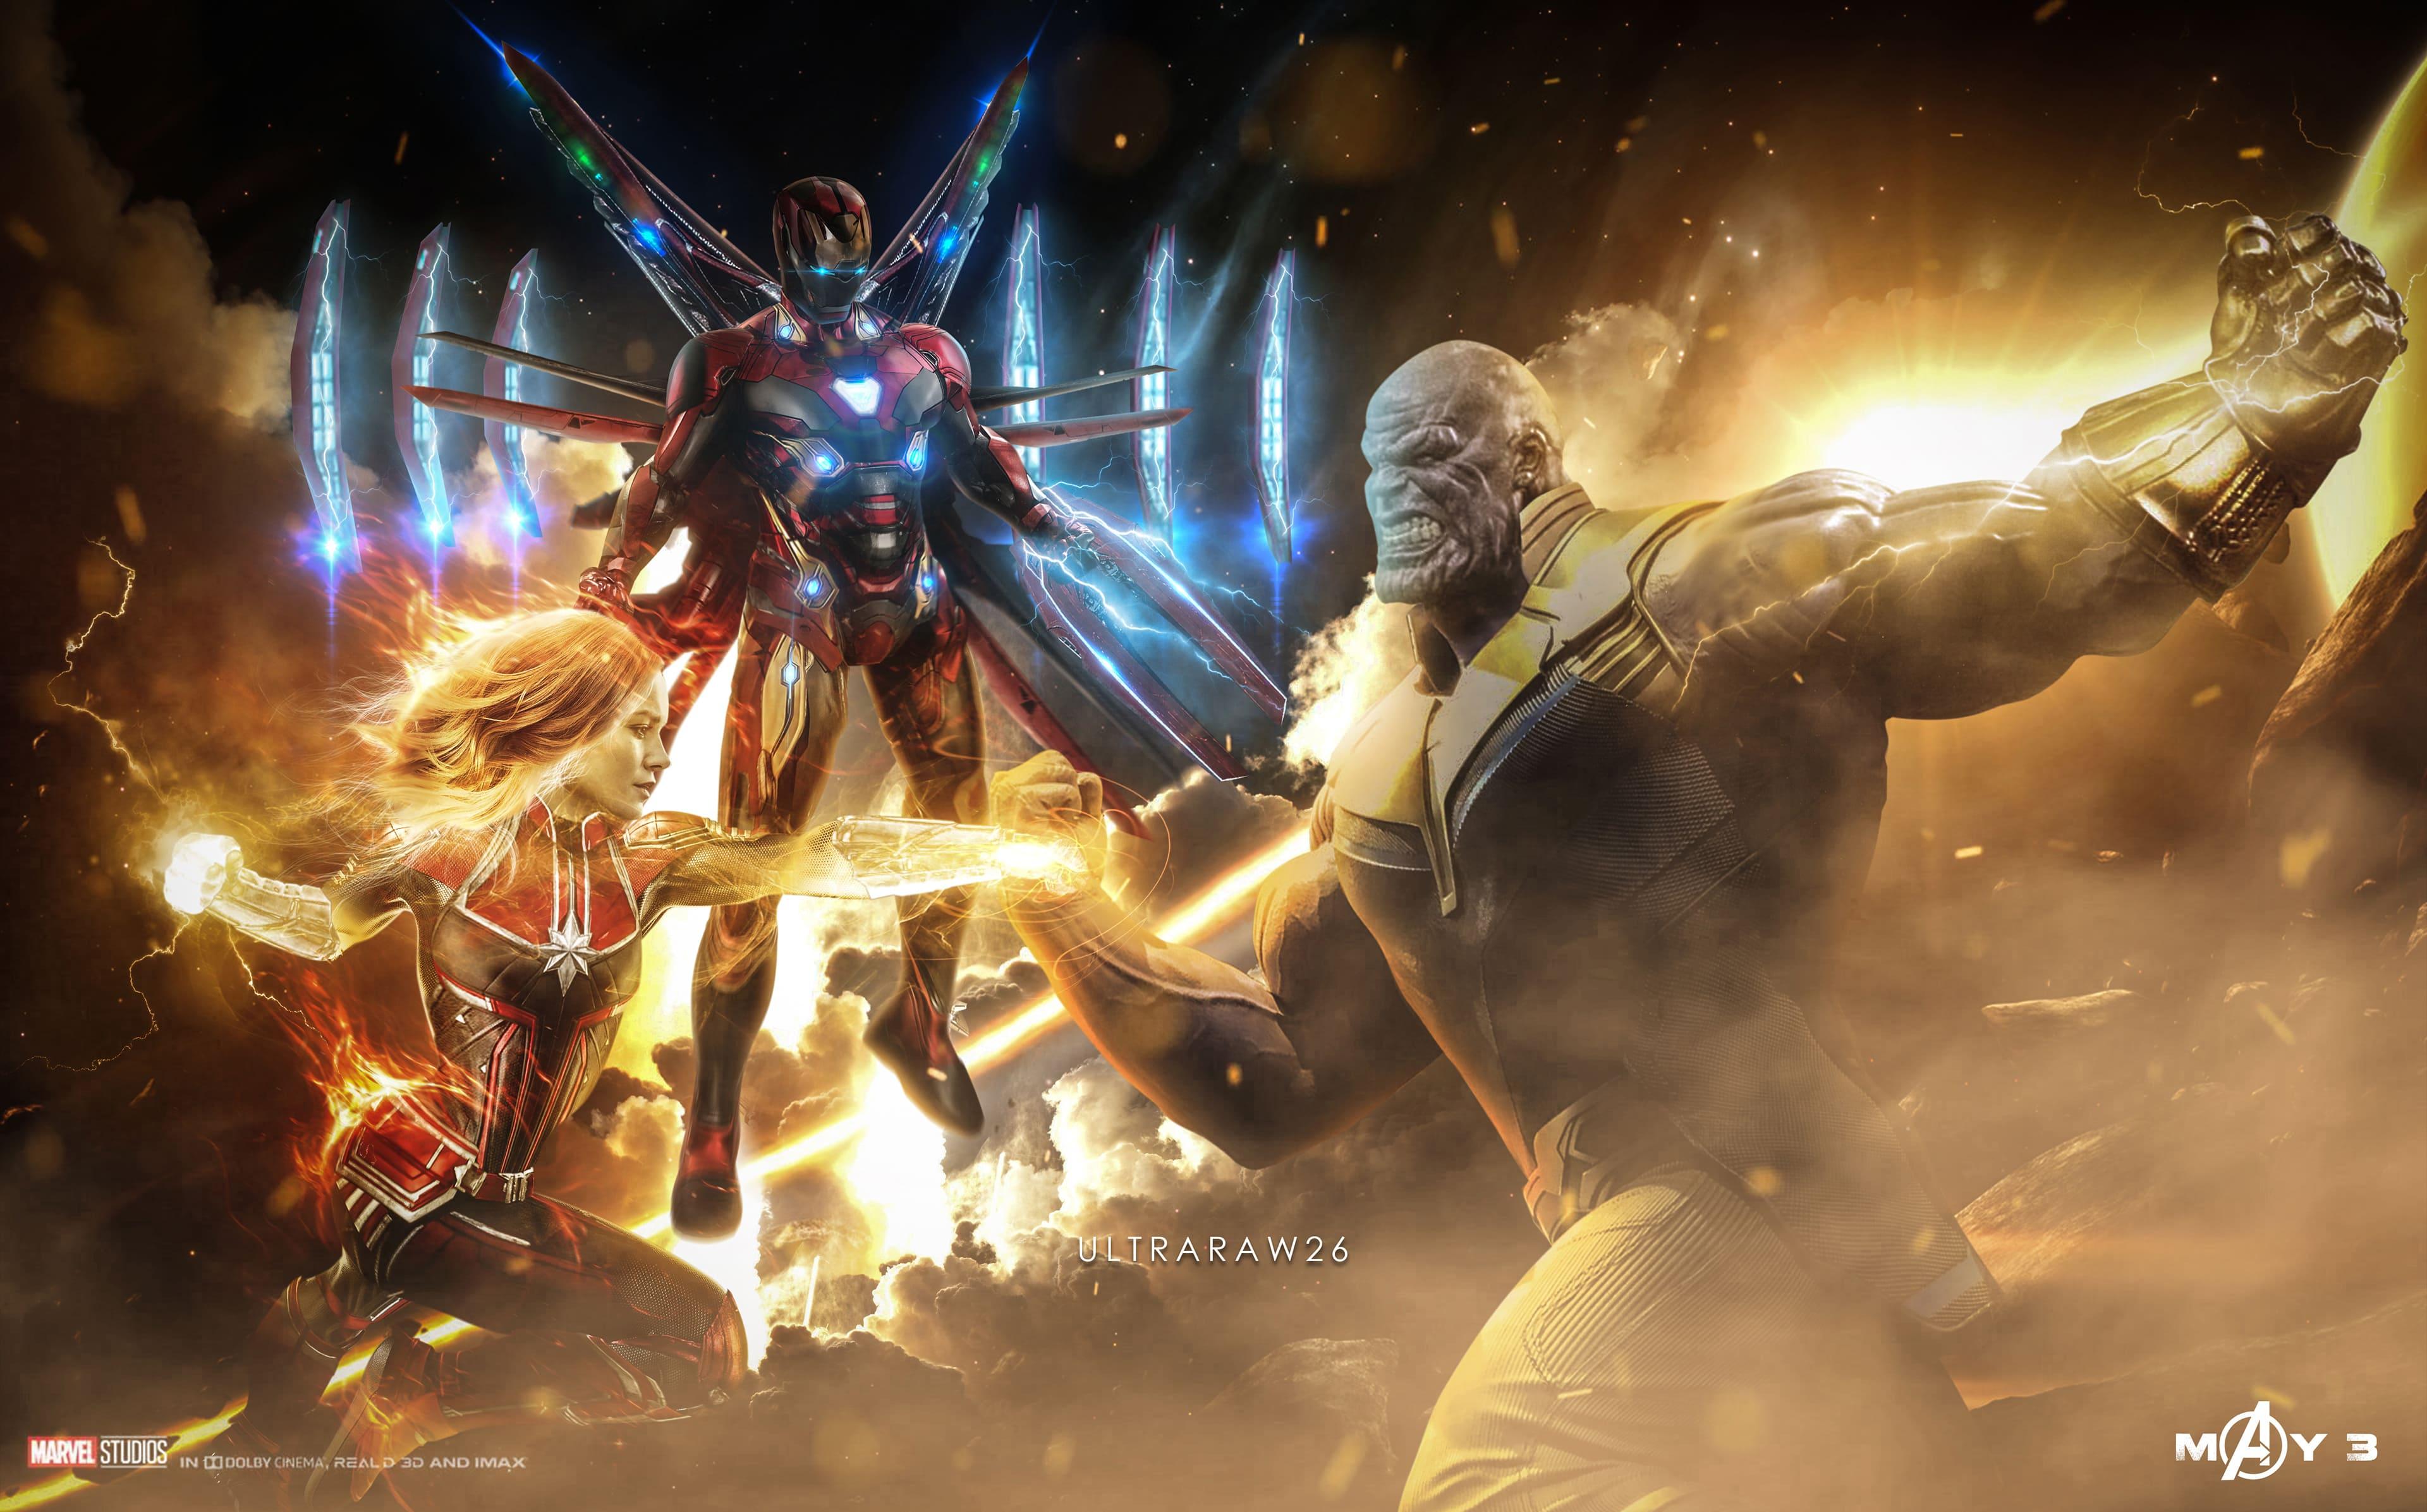 HDoboi.Kiev.ua - Мстители финал картинки на рабочий стол, avengers endgame ultra hd 4k